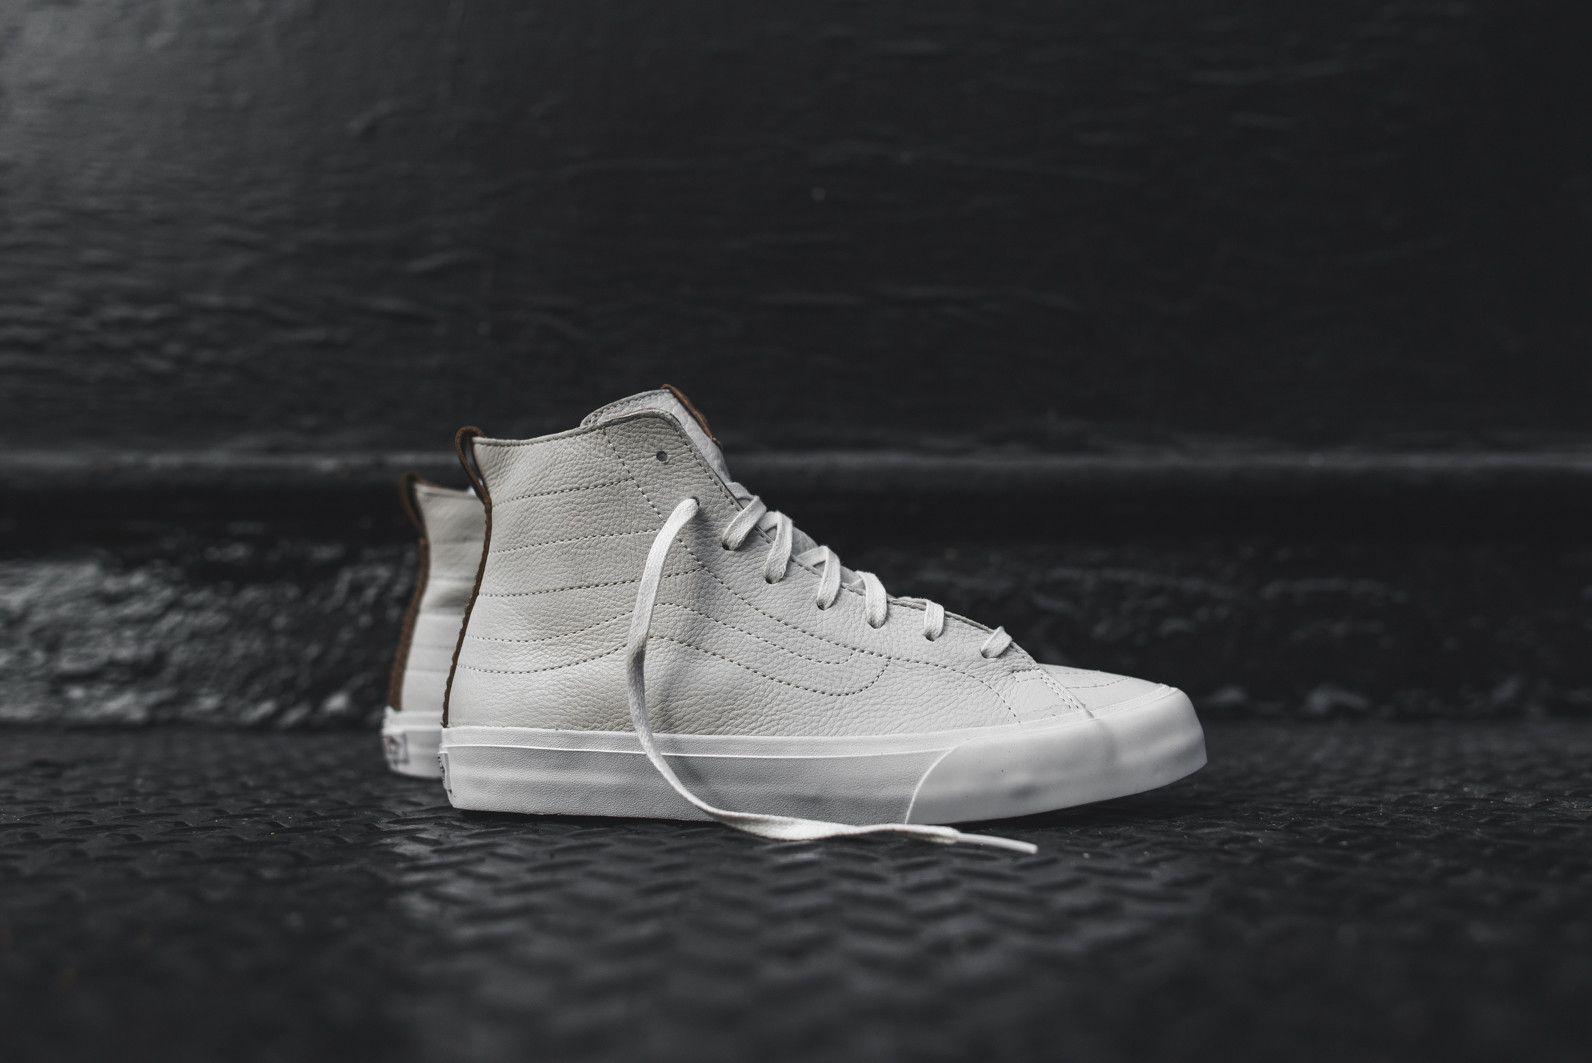 Vans CA Sk8Hi Decon  Winter White Mens Sneakers Leather